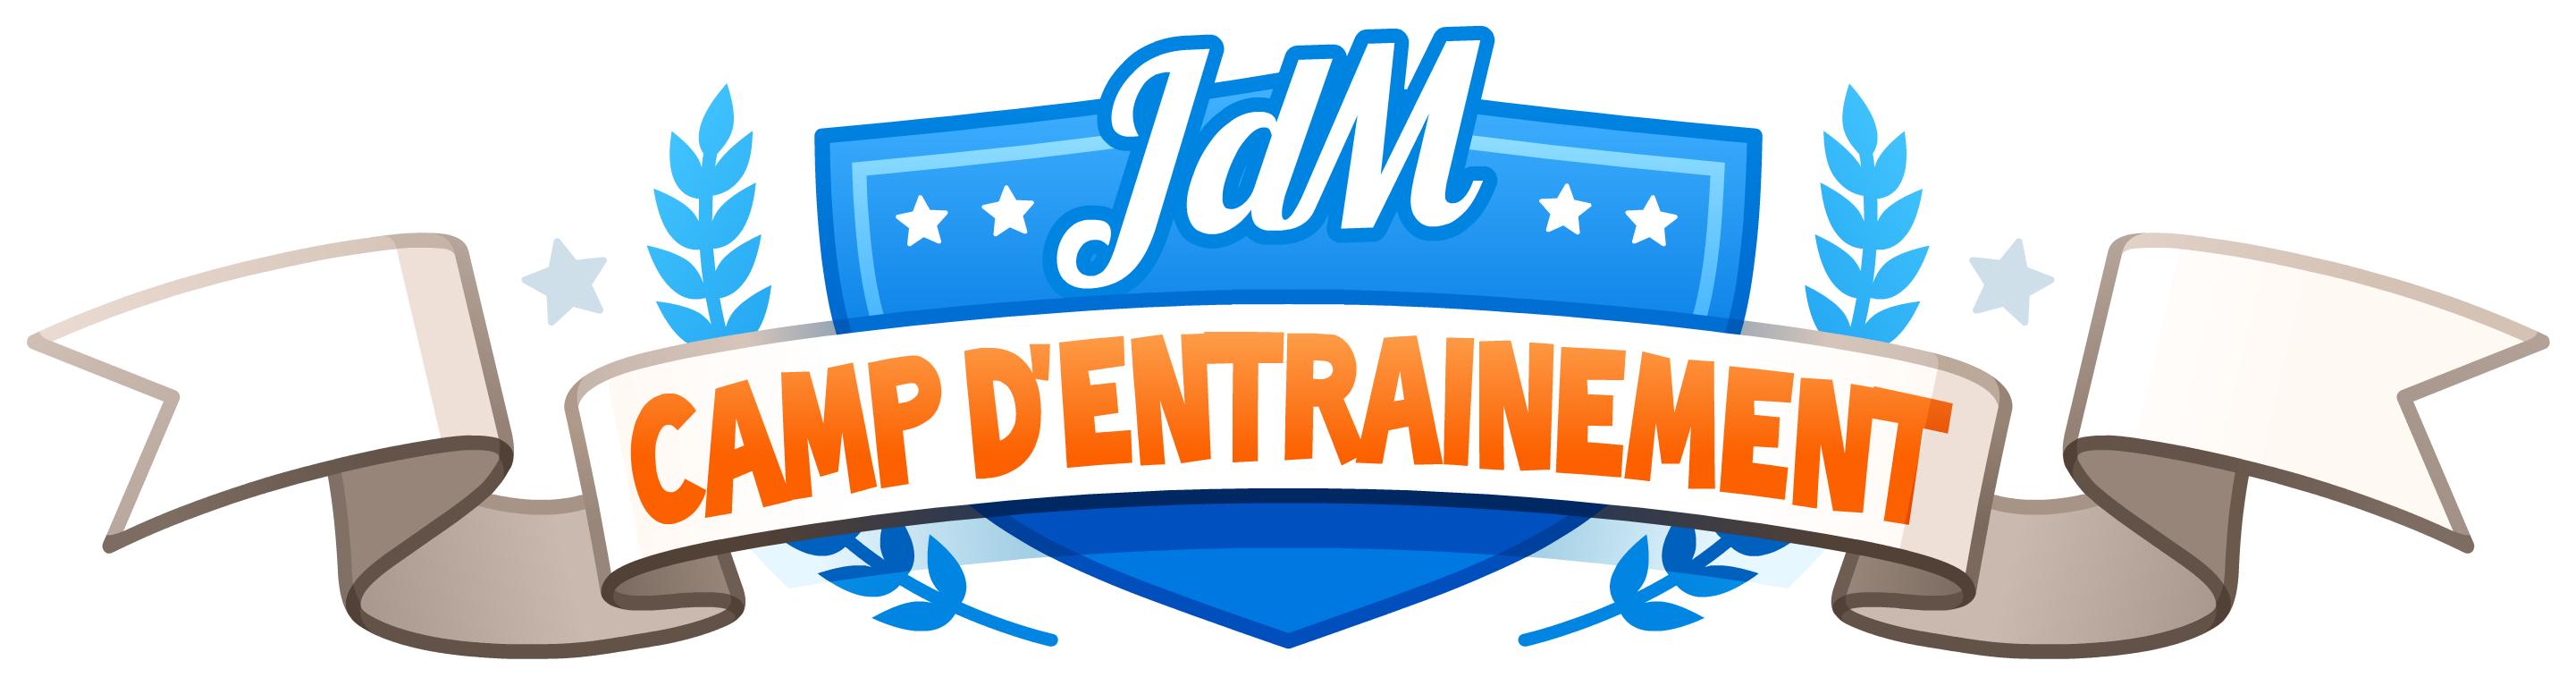 Camp_dentrainement_logo